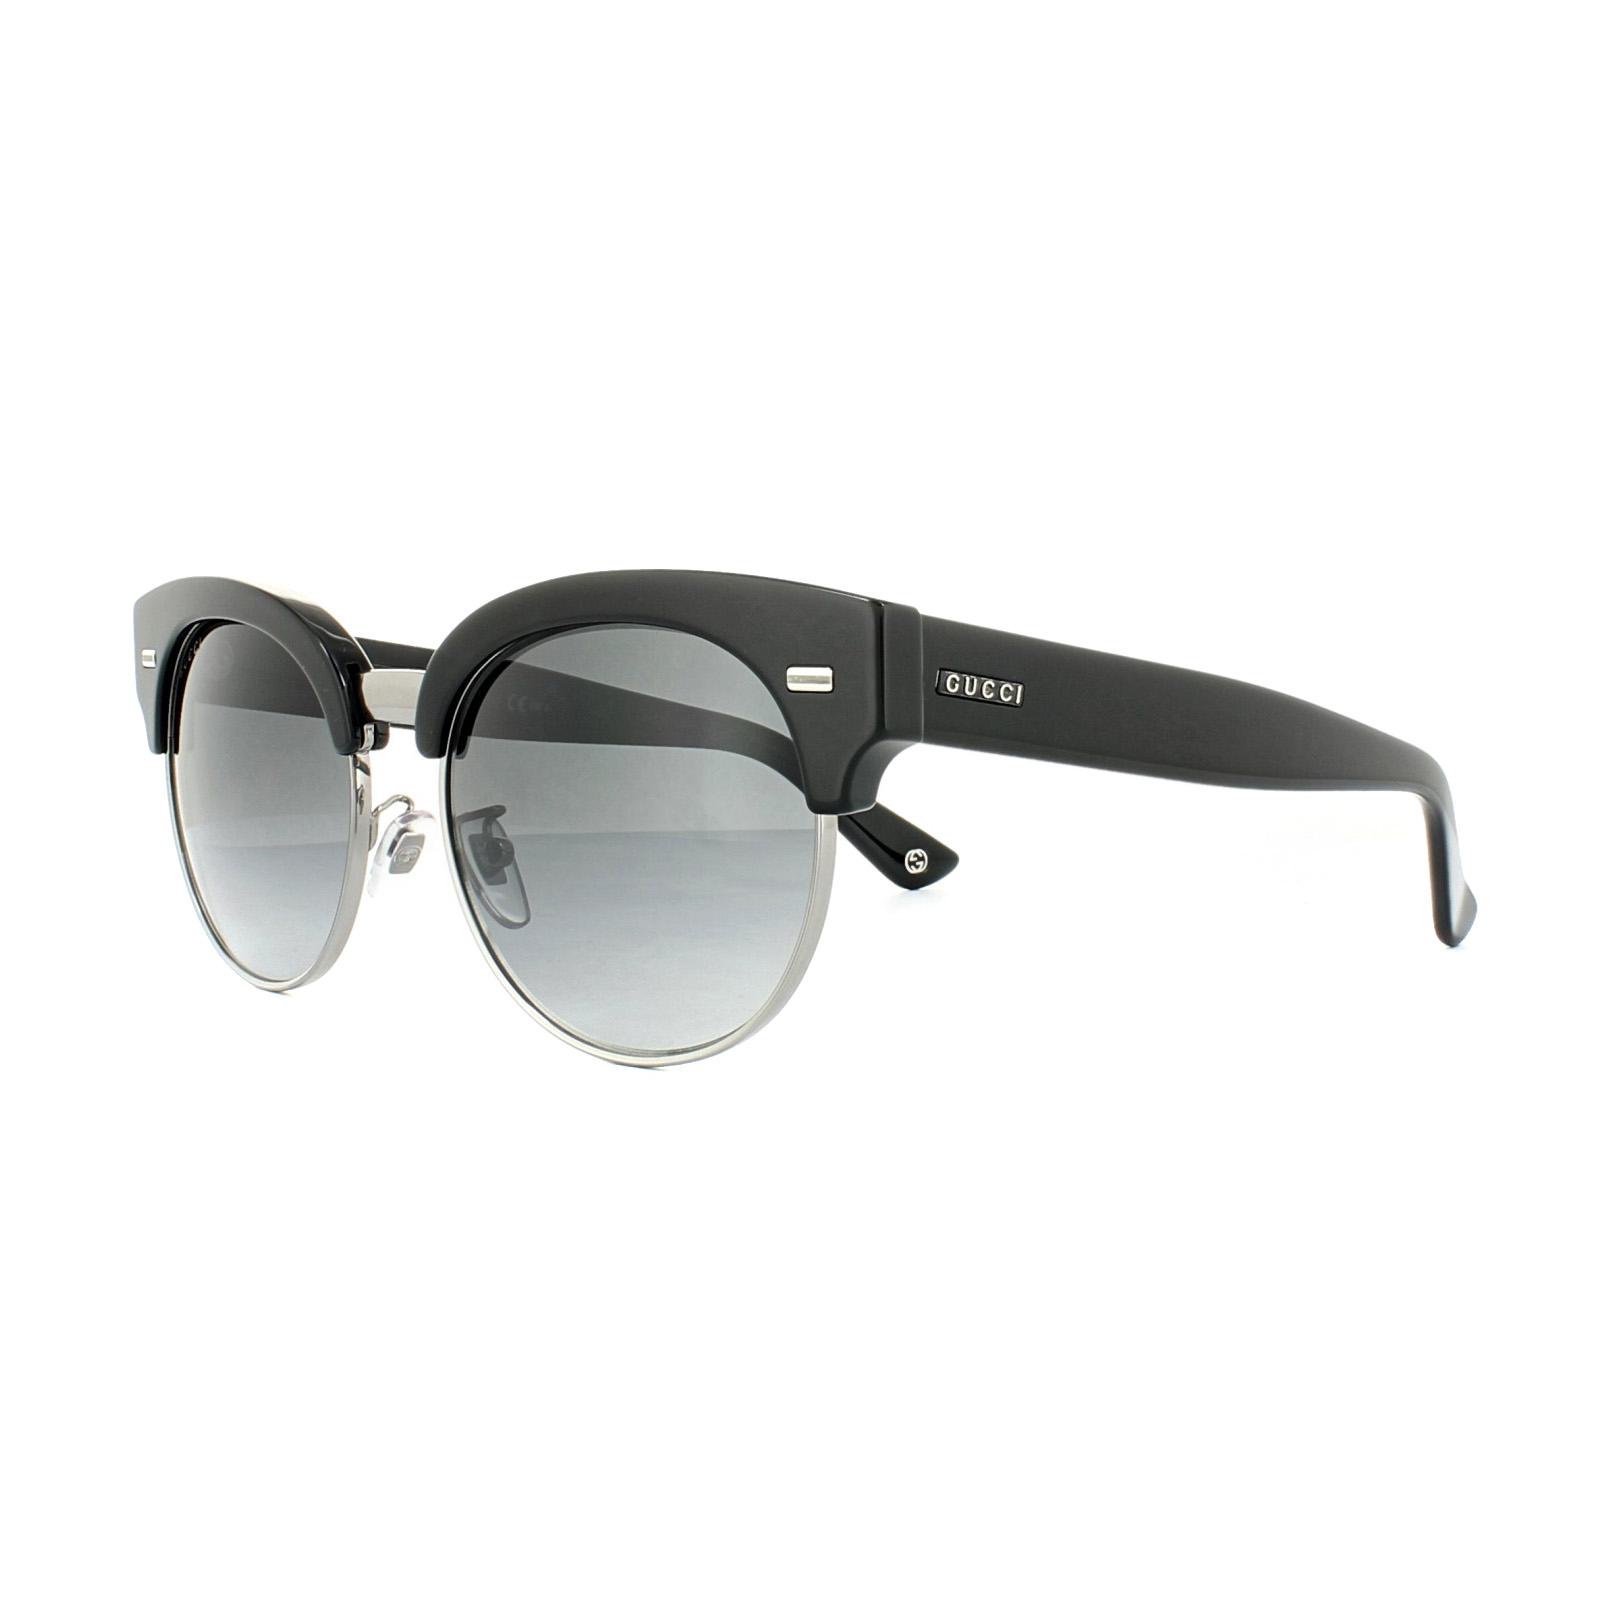 Gucci Gafas de sol 4278 U32 9o Negro Rutenio gris gris oscuro ...